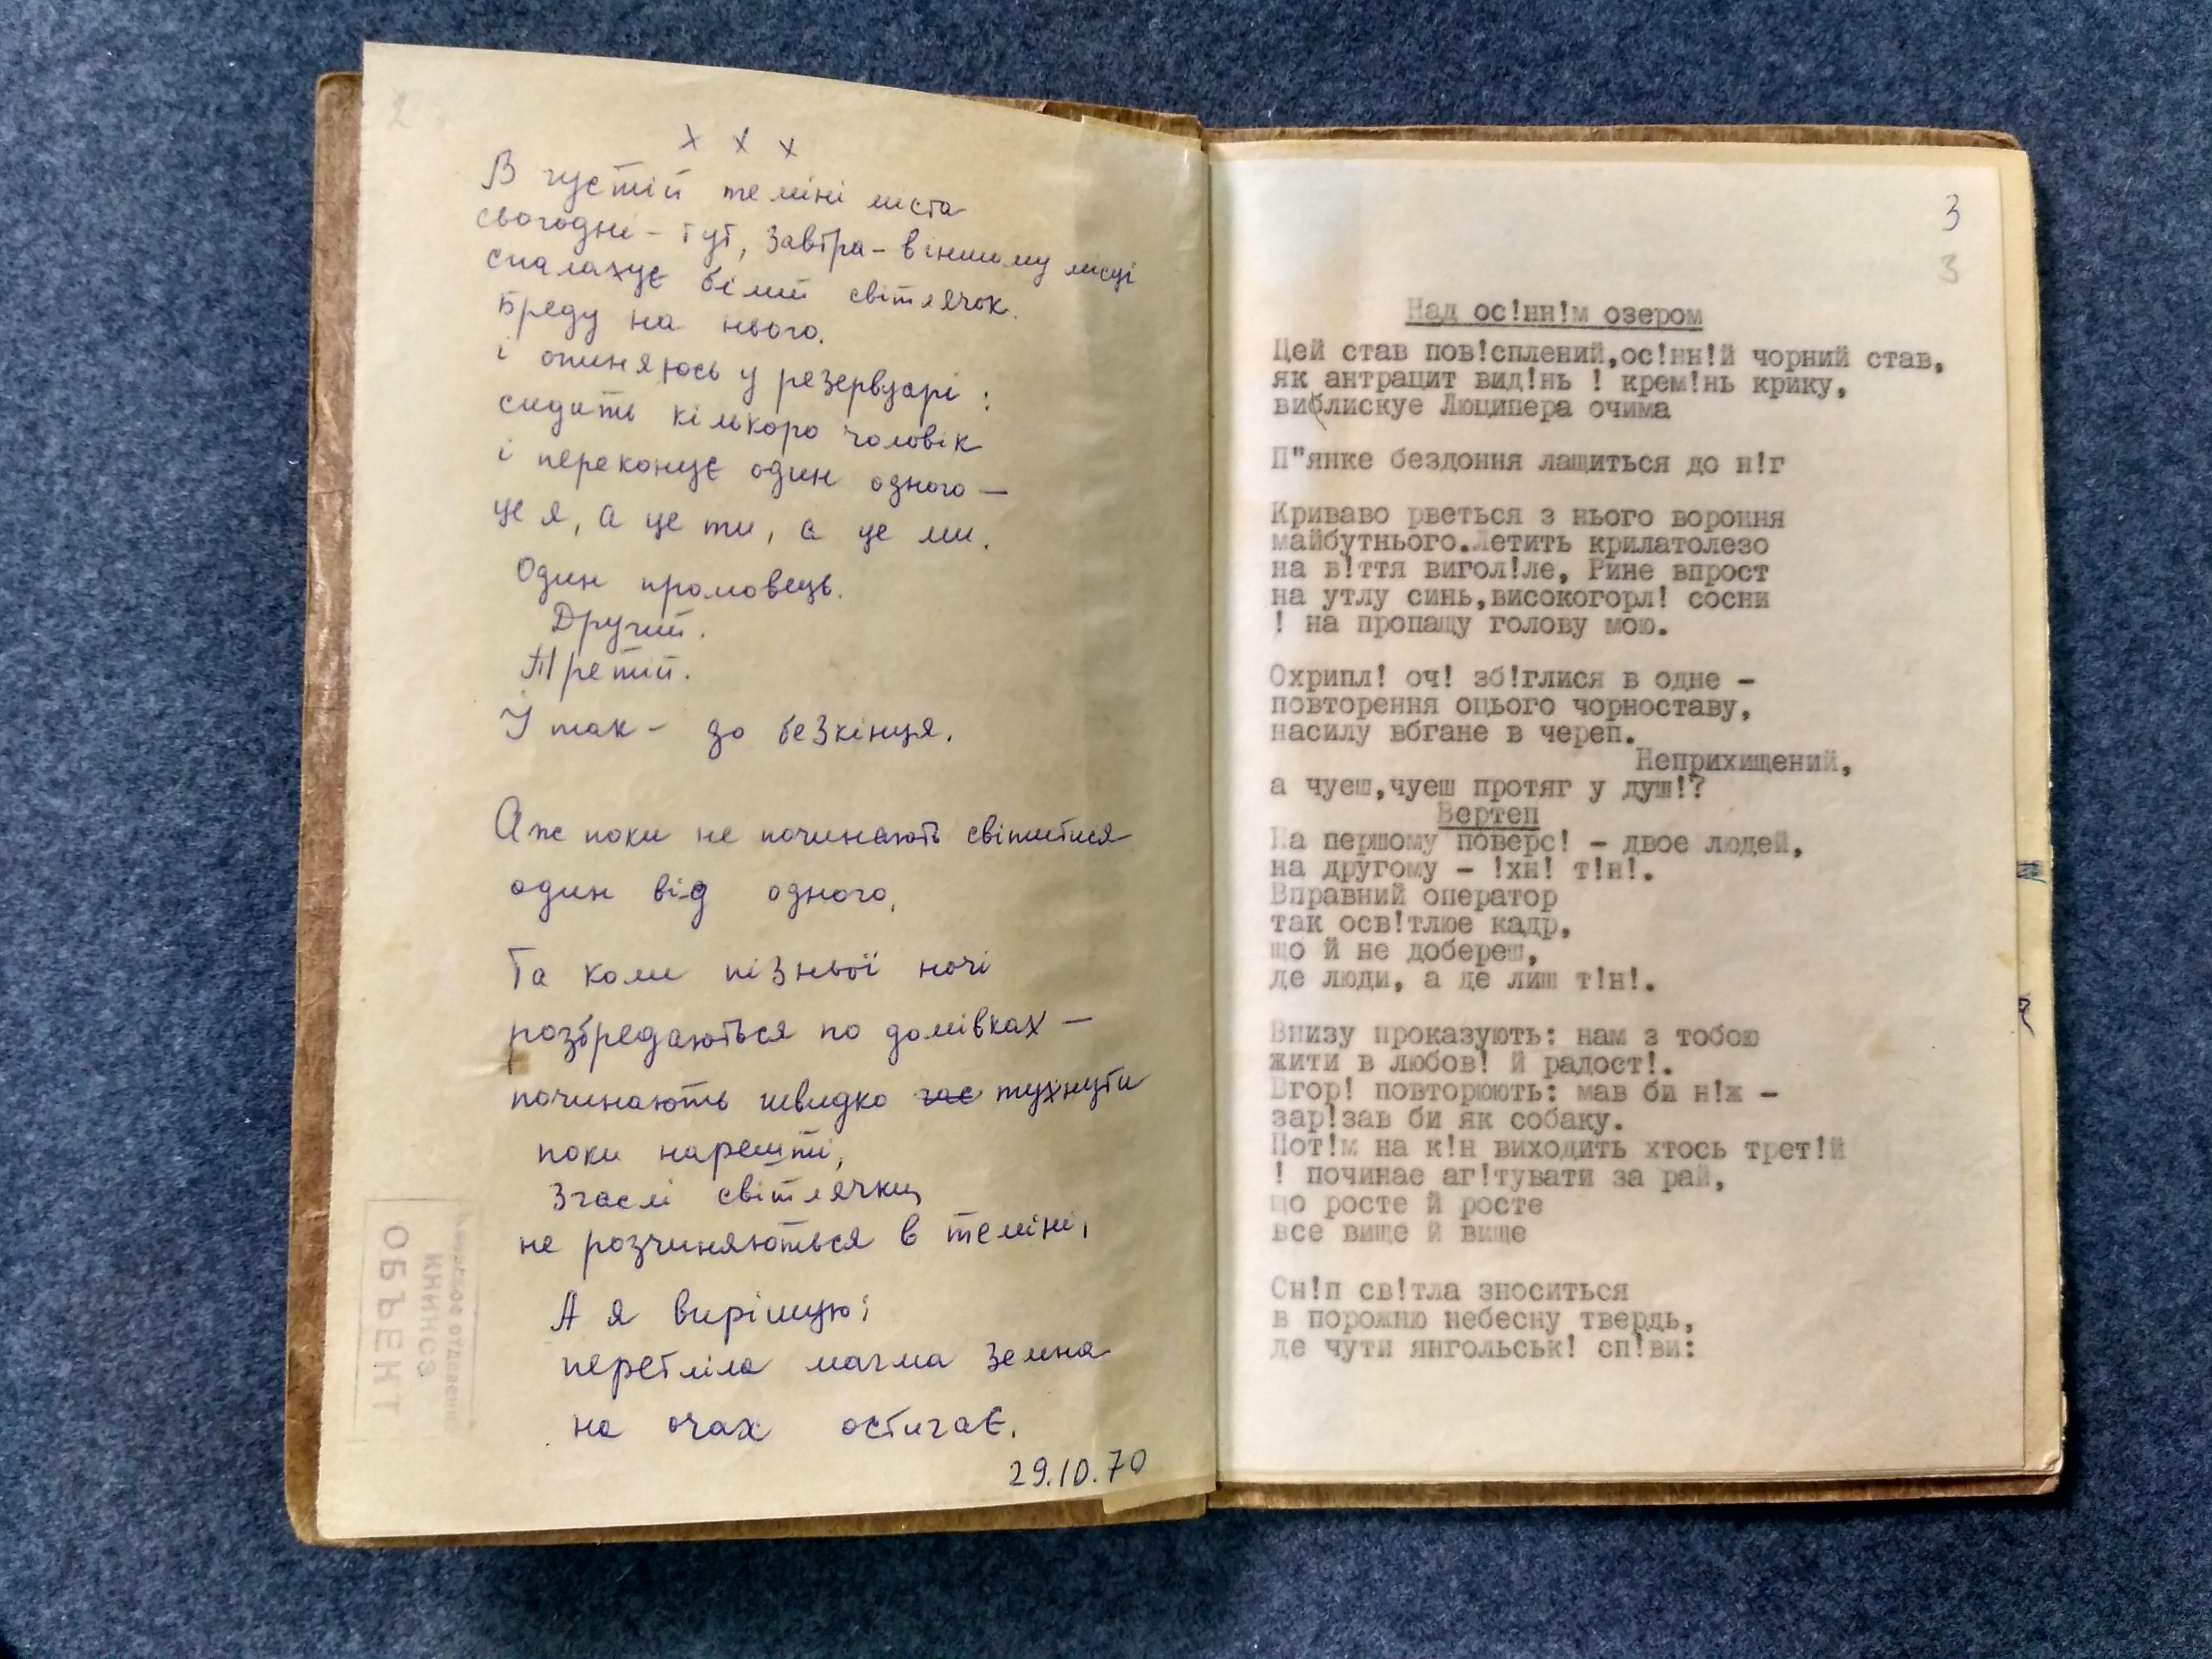 Stus, Vasyl. The Merry Cemetery (Veselyi Tsvyntar), 1970. Samizdat manuscript.